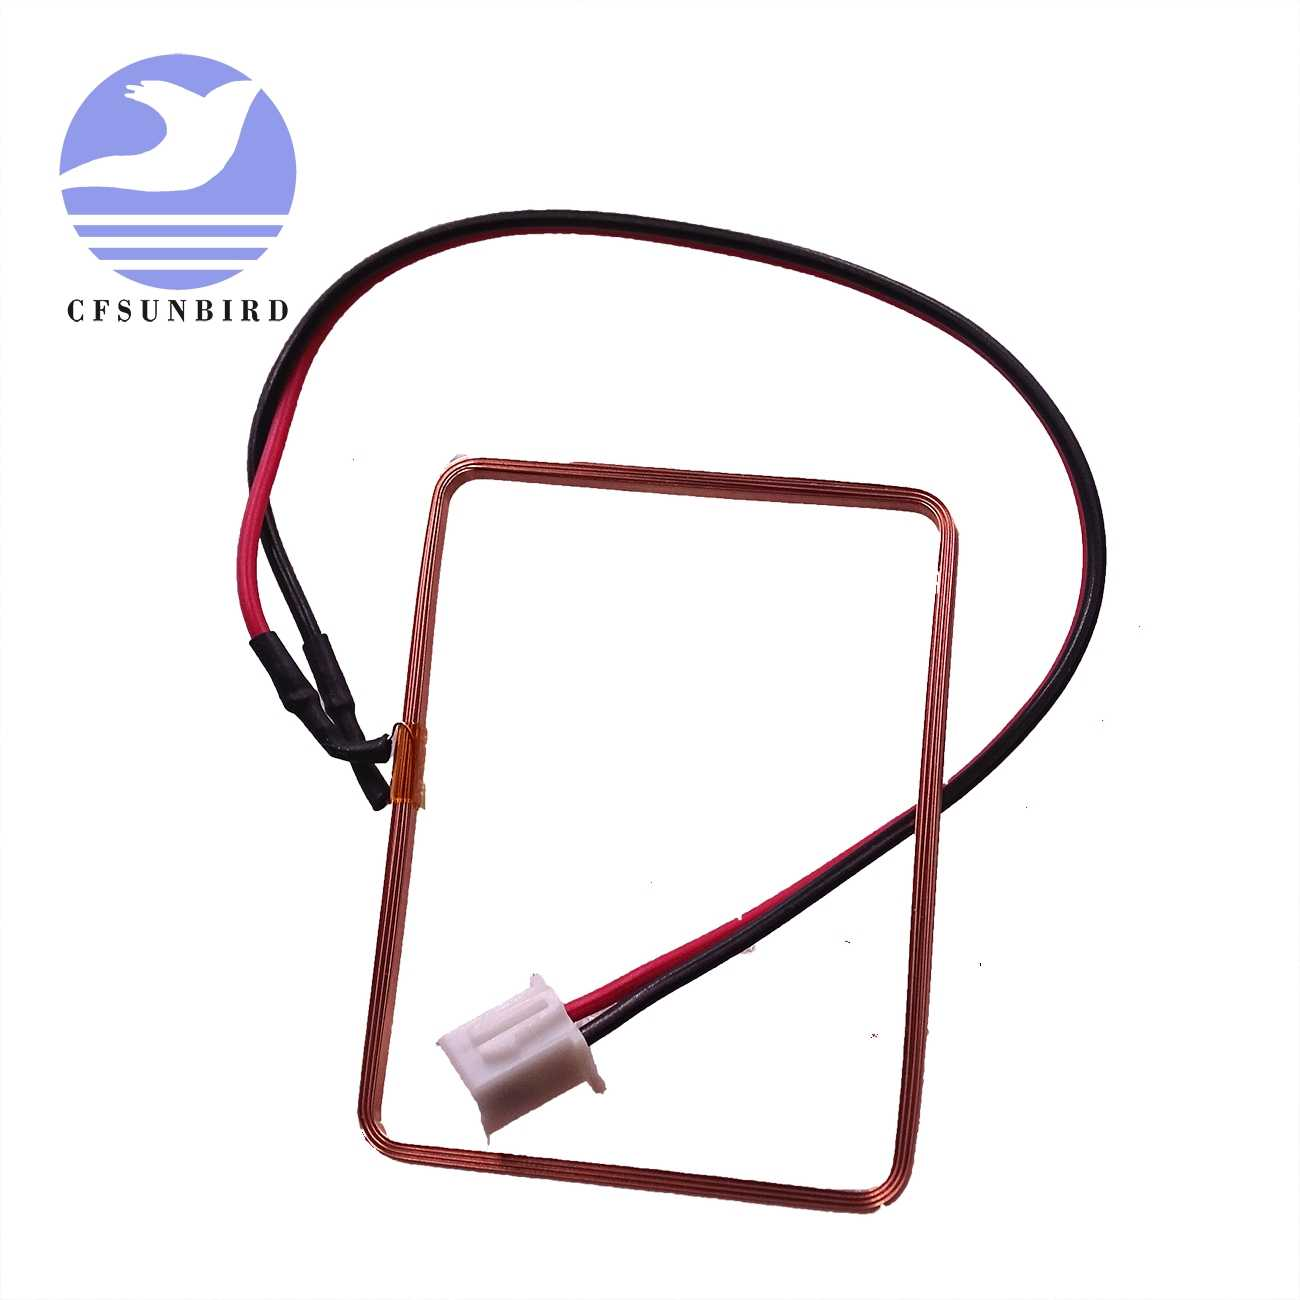 UART 125 KHz EM4100 Kartu RFID ID Kunci Reader Modul RDM6300 (RDM630) UNTUK ARDUINO